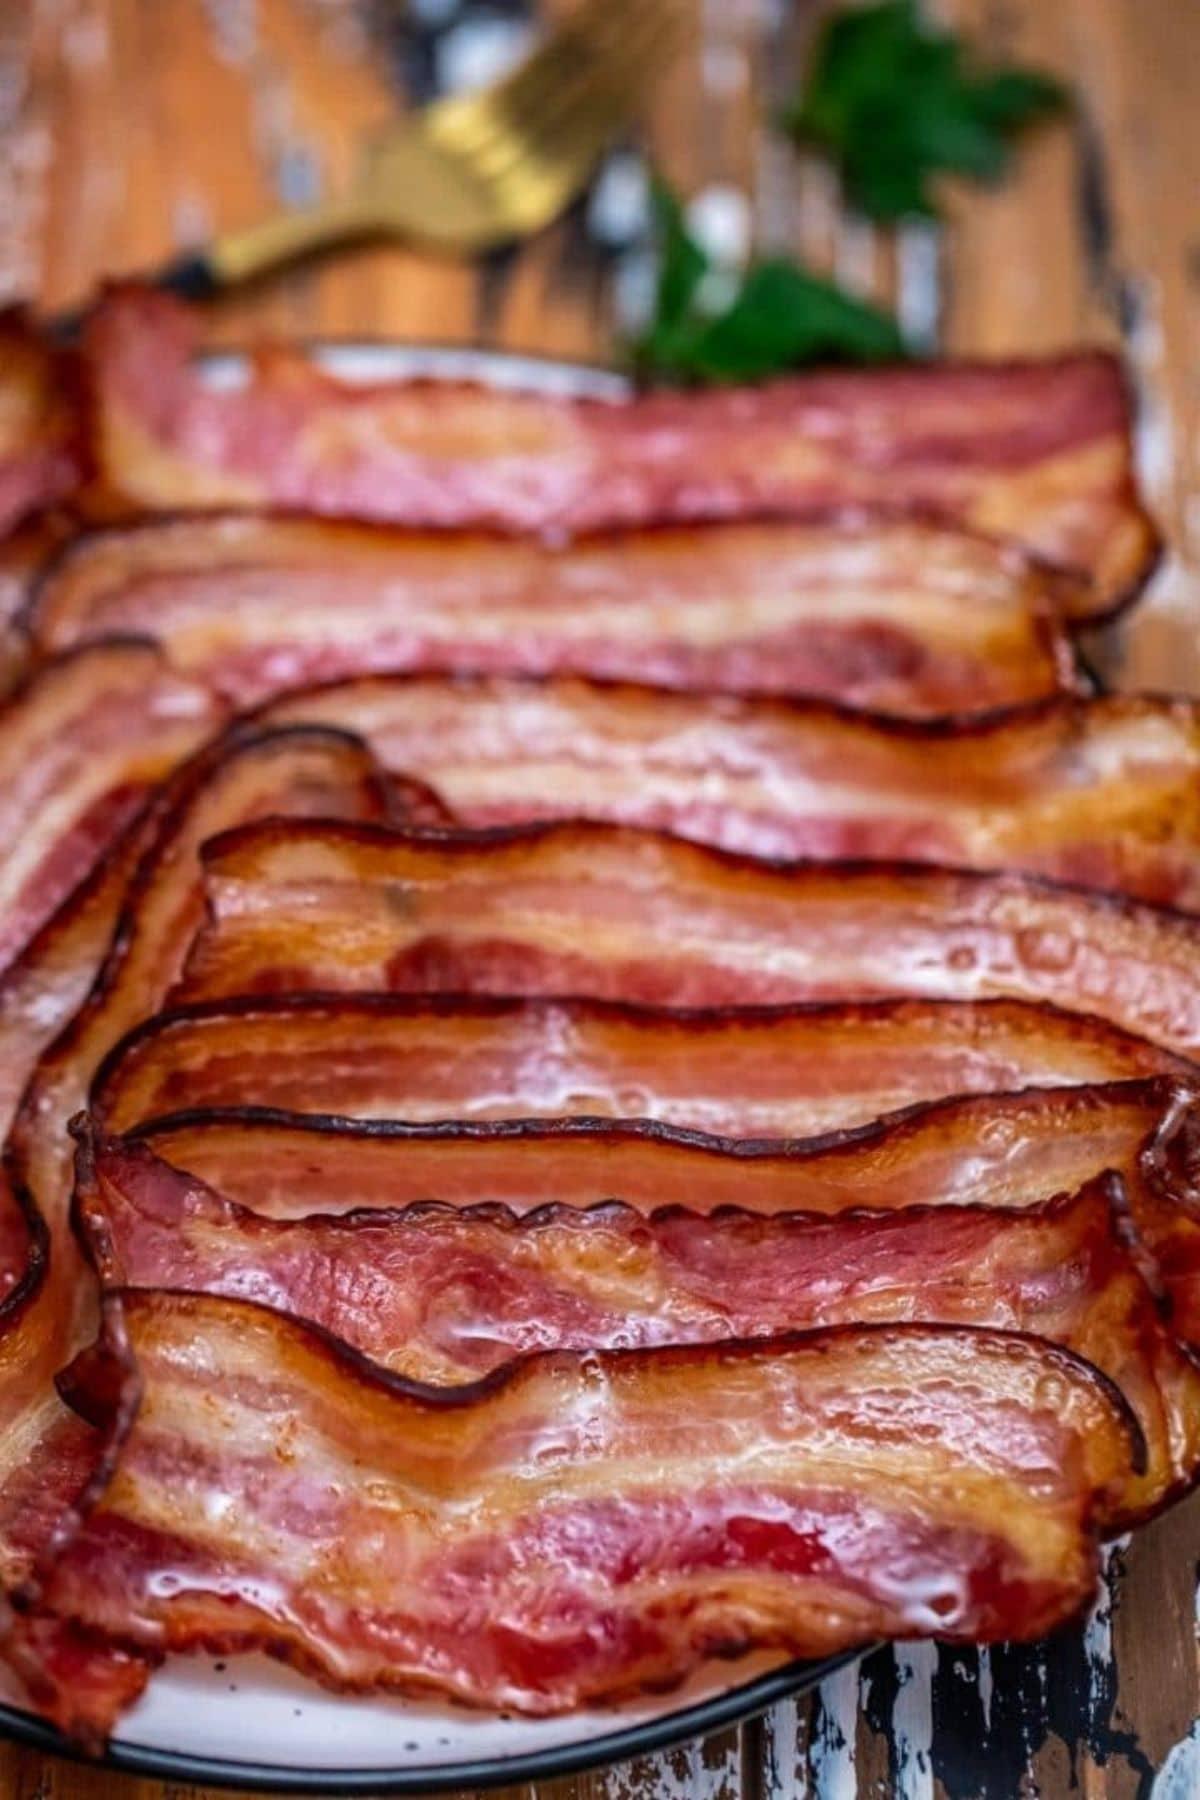 Bacon on platter